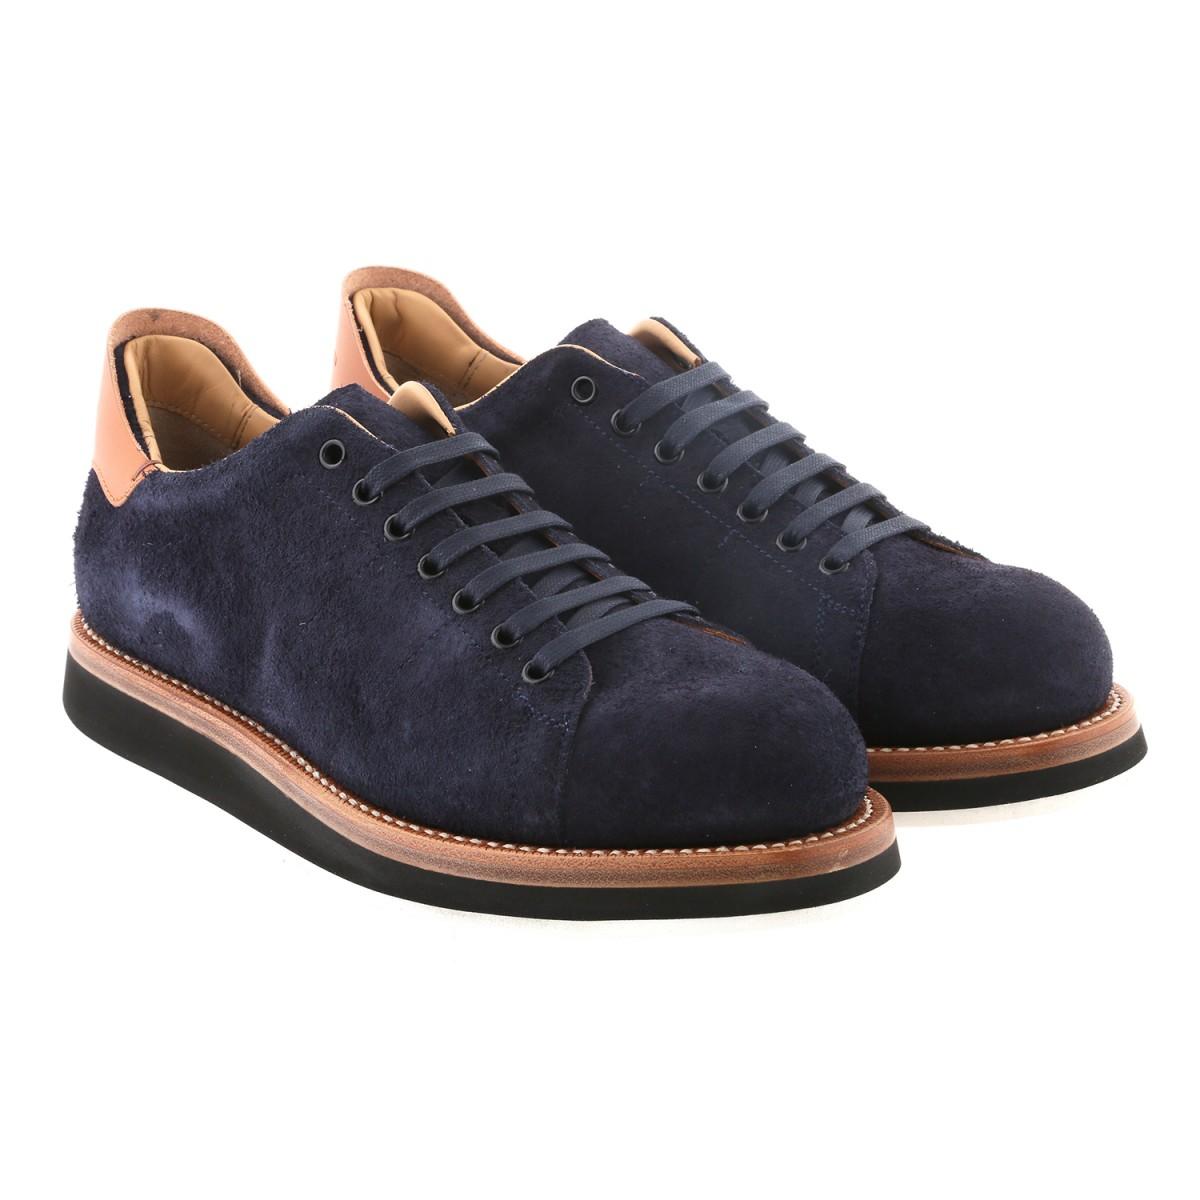 Cappelletti Men's Sneakers